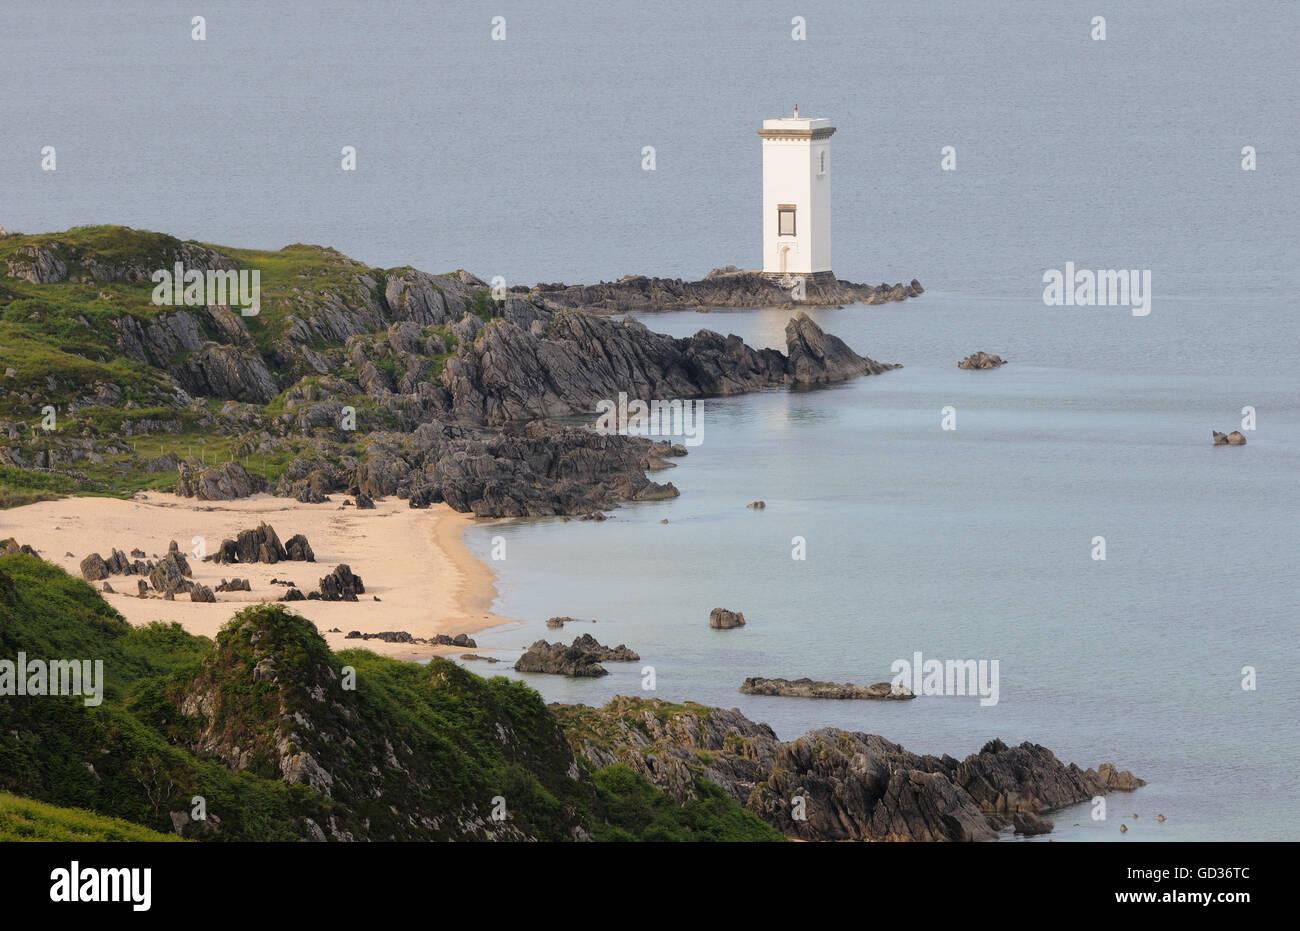 Lighthouse at Carraig Fhada, Port Ellen, Port Eilein, Islay, Inner Hebrides, Argyll, Scotland, UK. - Stock Image